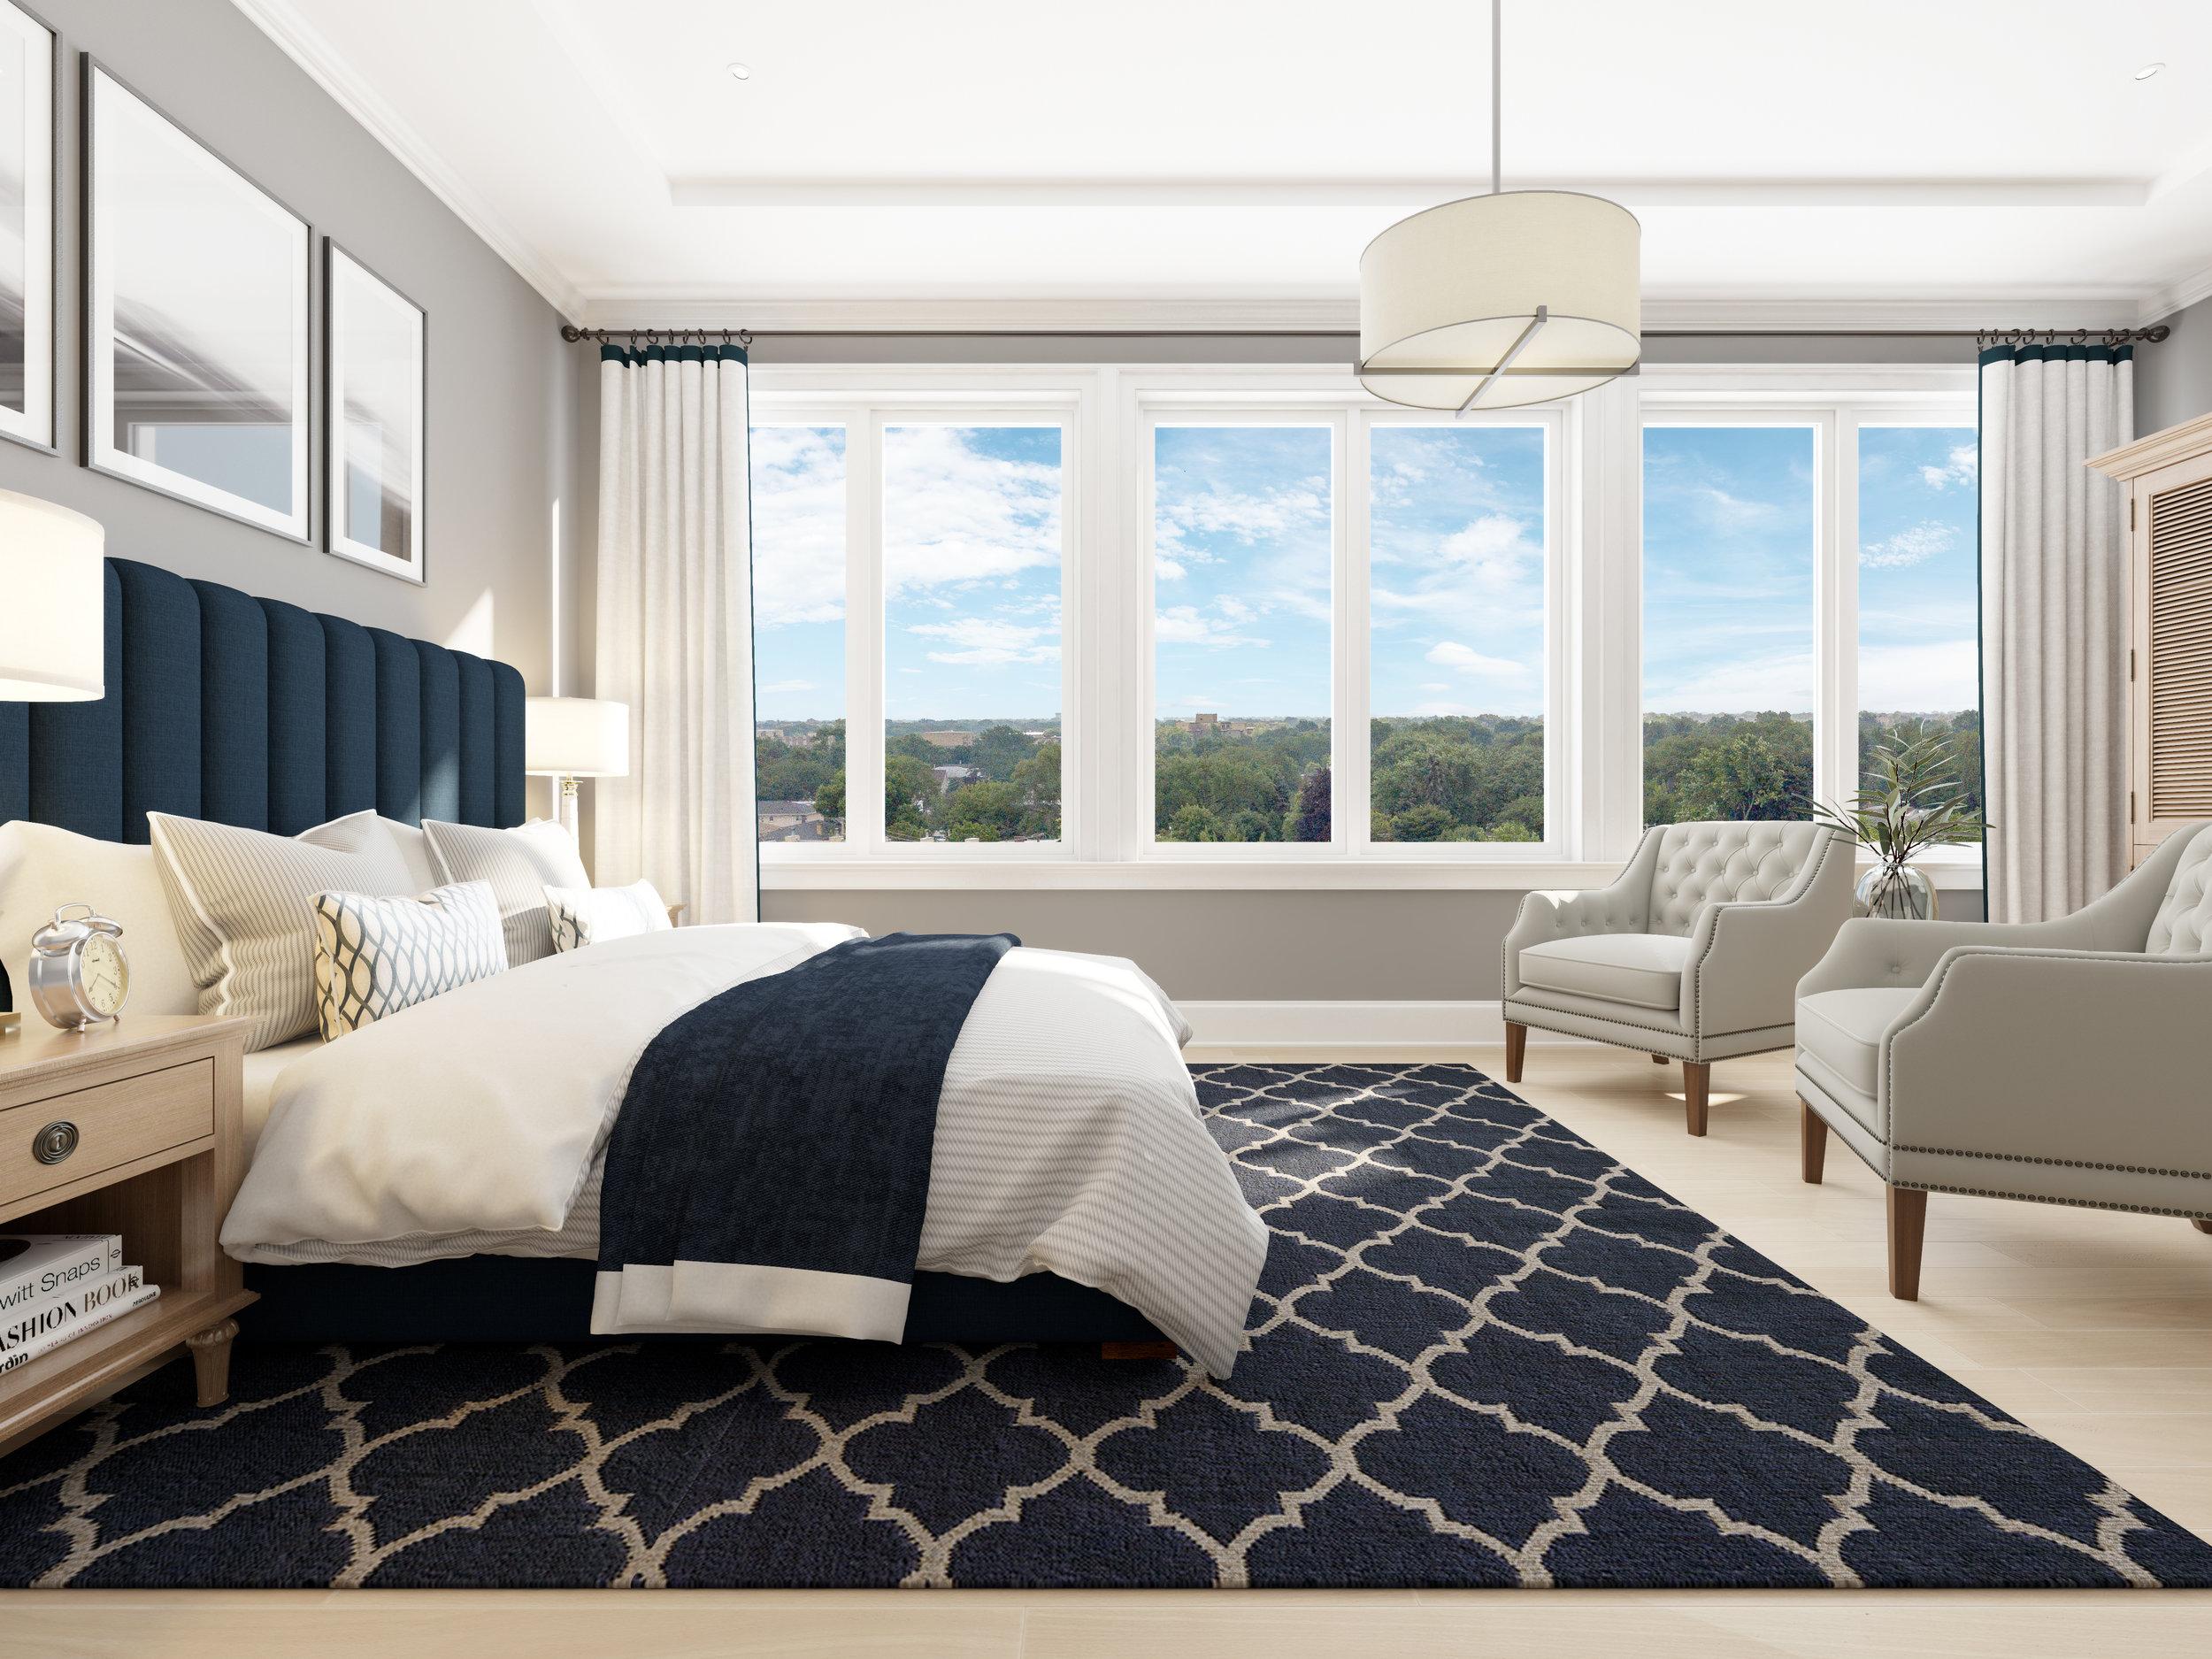 1701_Bedroom_Final.jpg